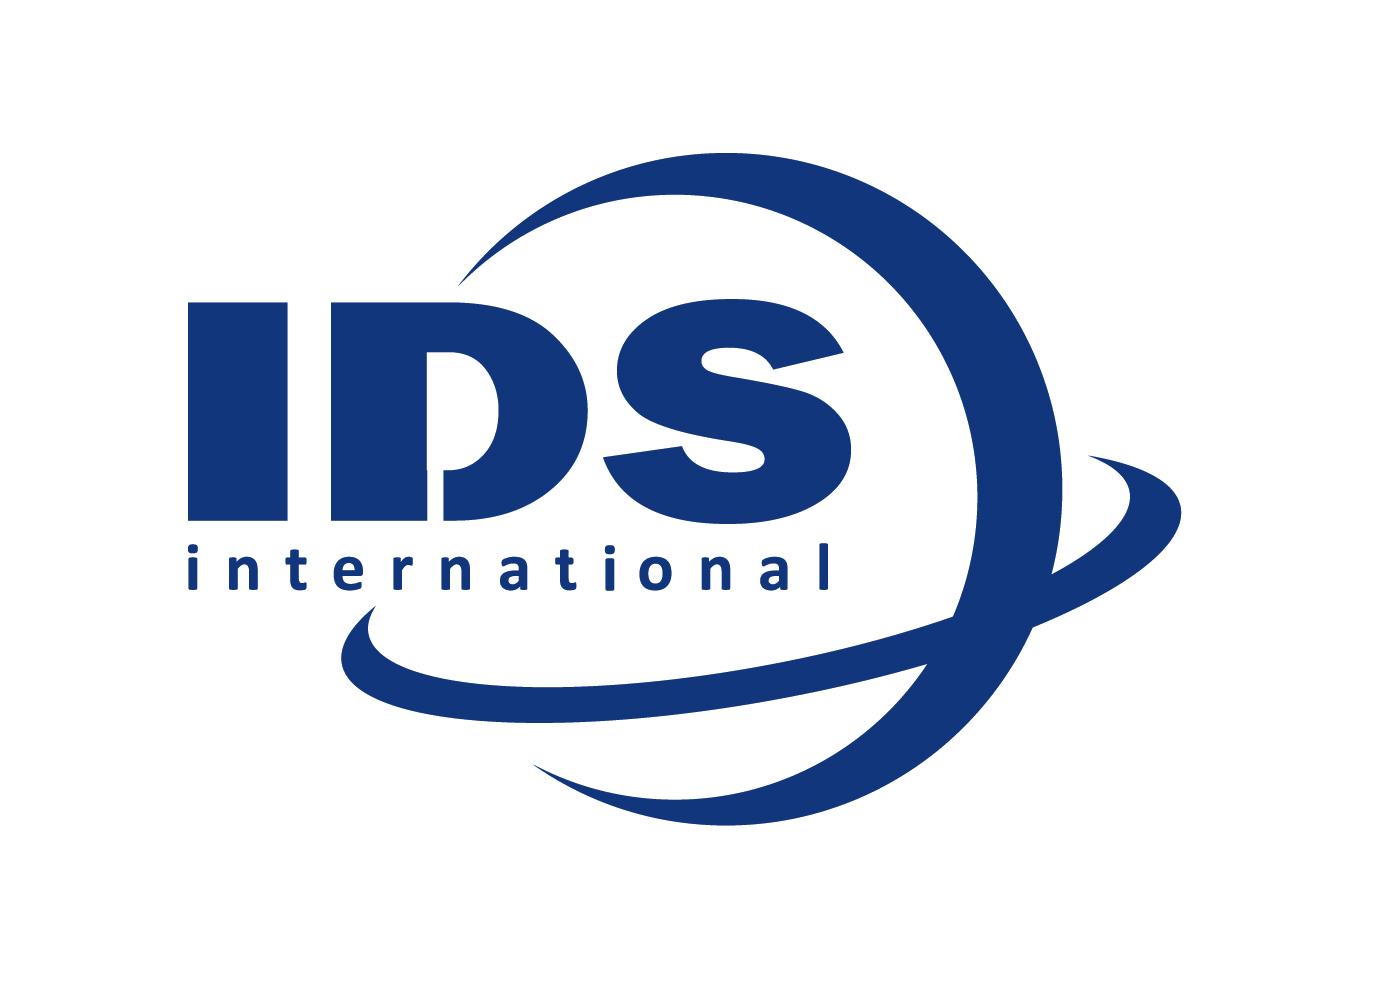 ids international design